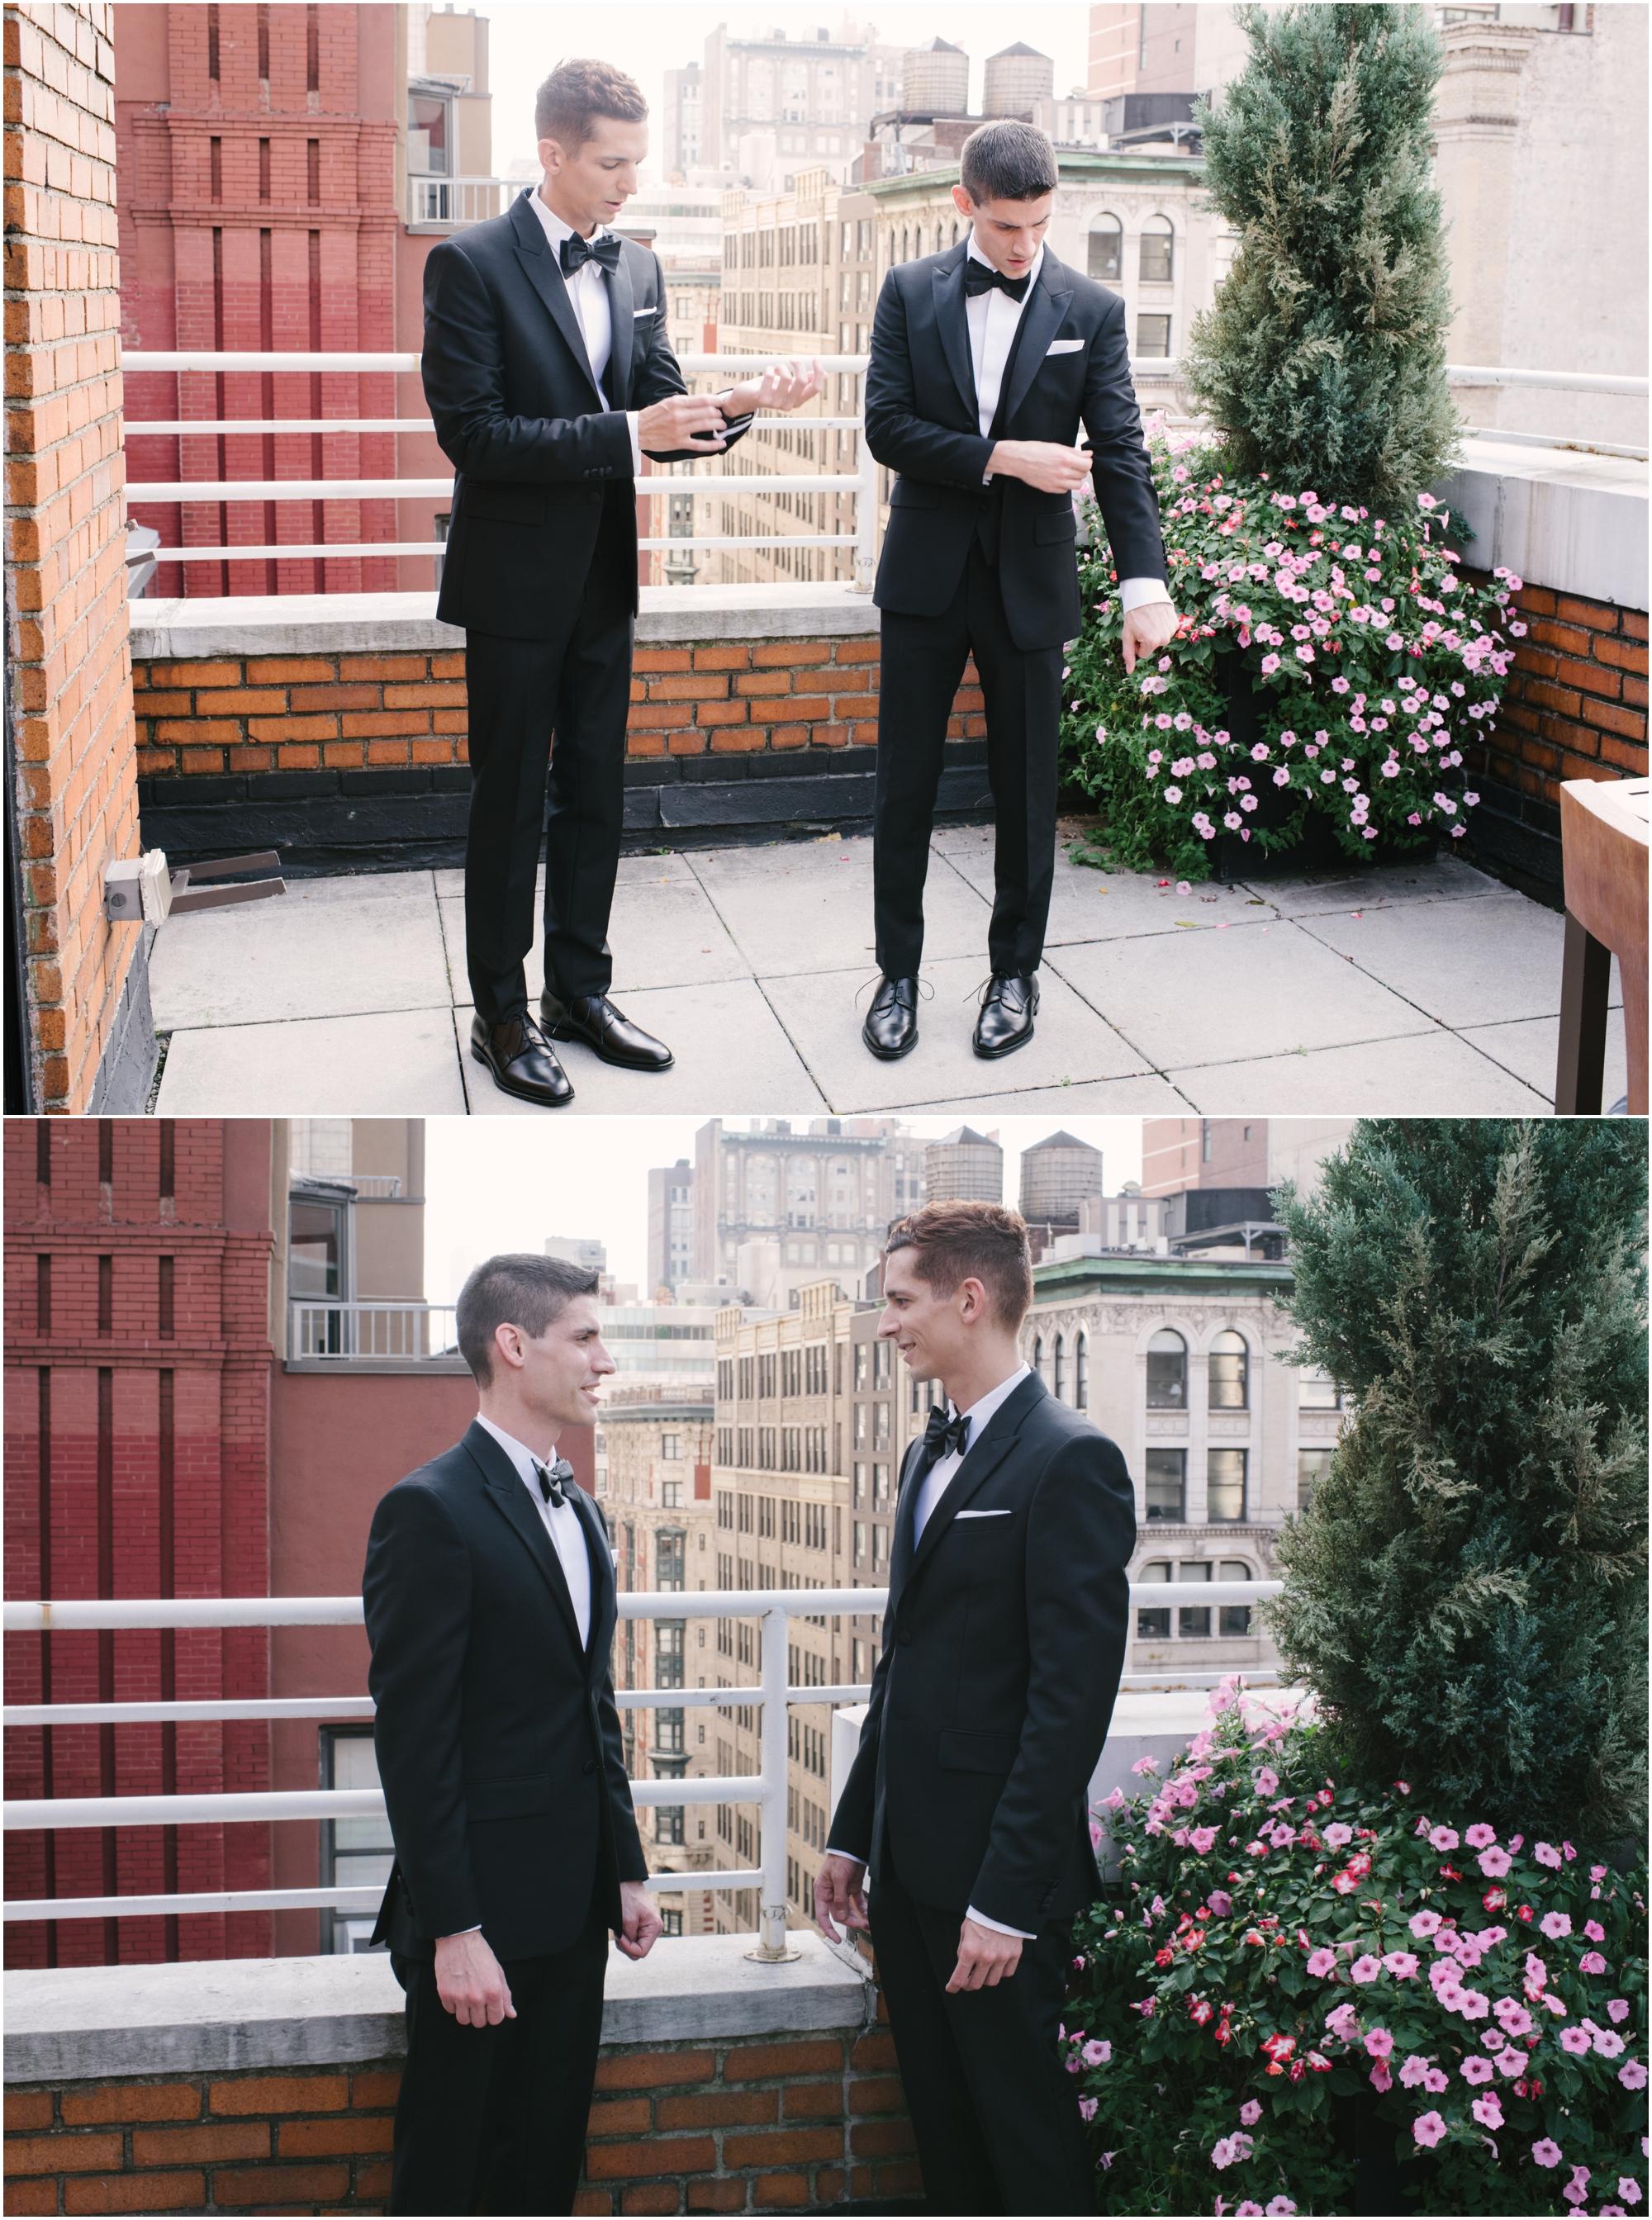 gay-wedding-photographer-williamsburgphotostudios-thefoundry-wedding-photographer_0019.jpg